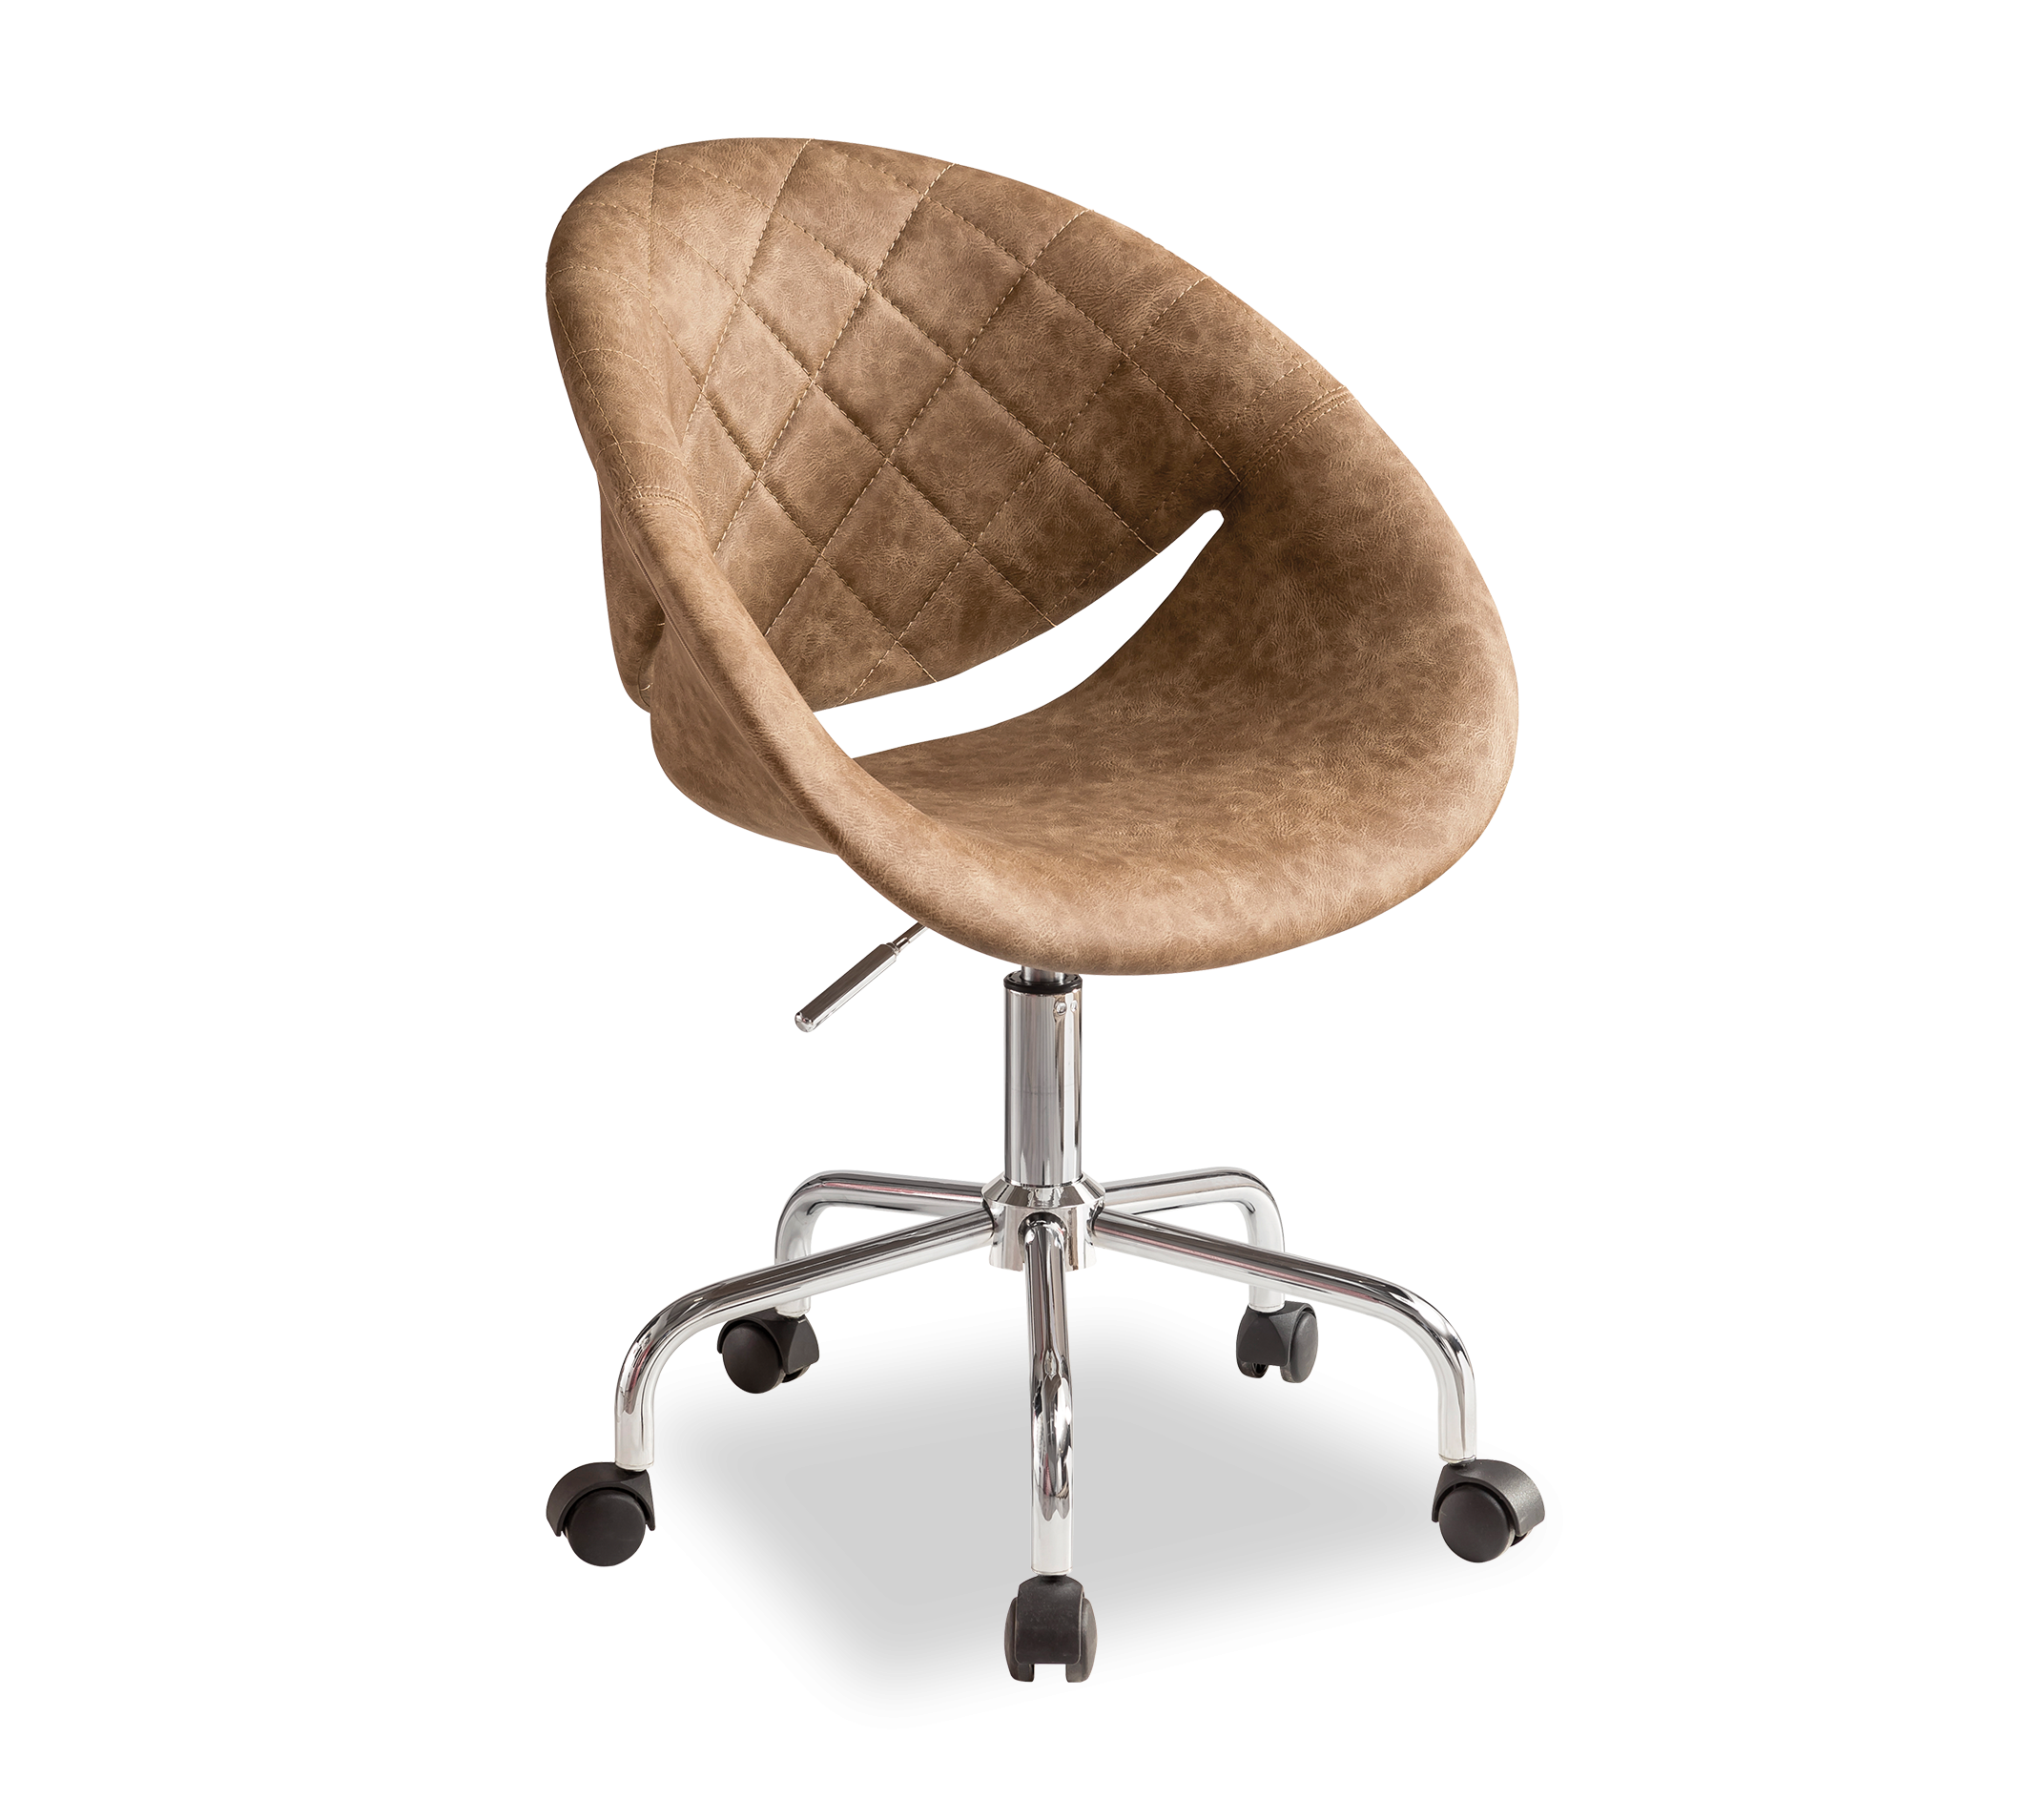 Scaun de birou tapitat cu piele ecologica, Relax Brown, l61xA54xH88-95 cm imagine